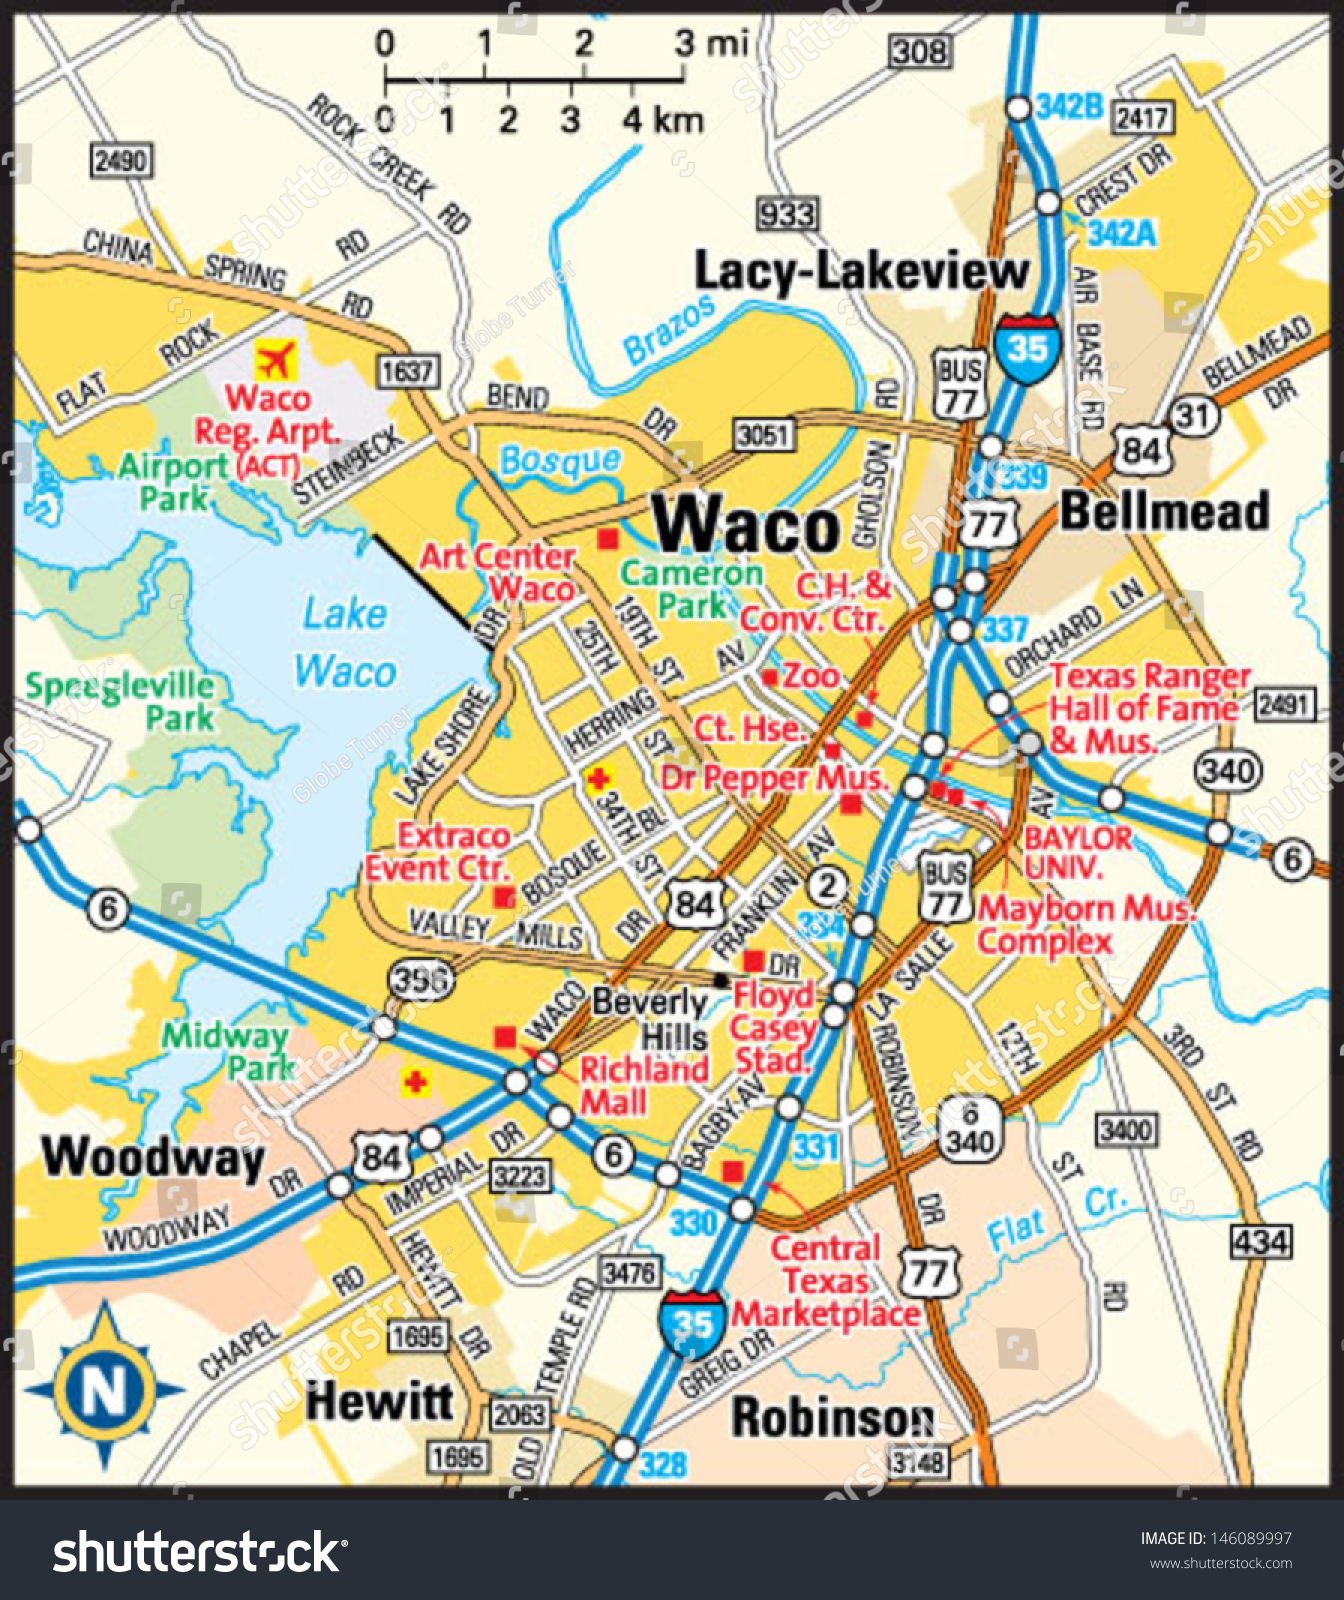 Map Of Waco Texas | Business Ideas 2013 - Waco Texas Weather Map